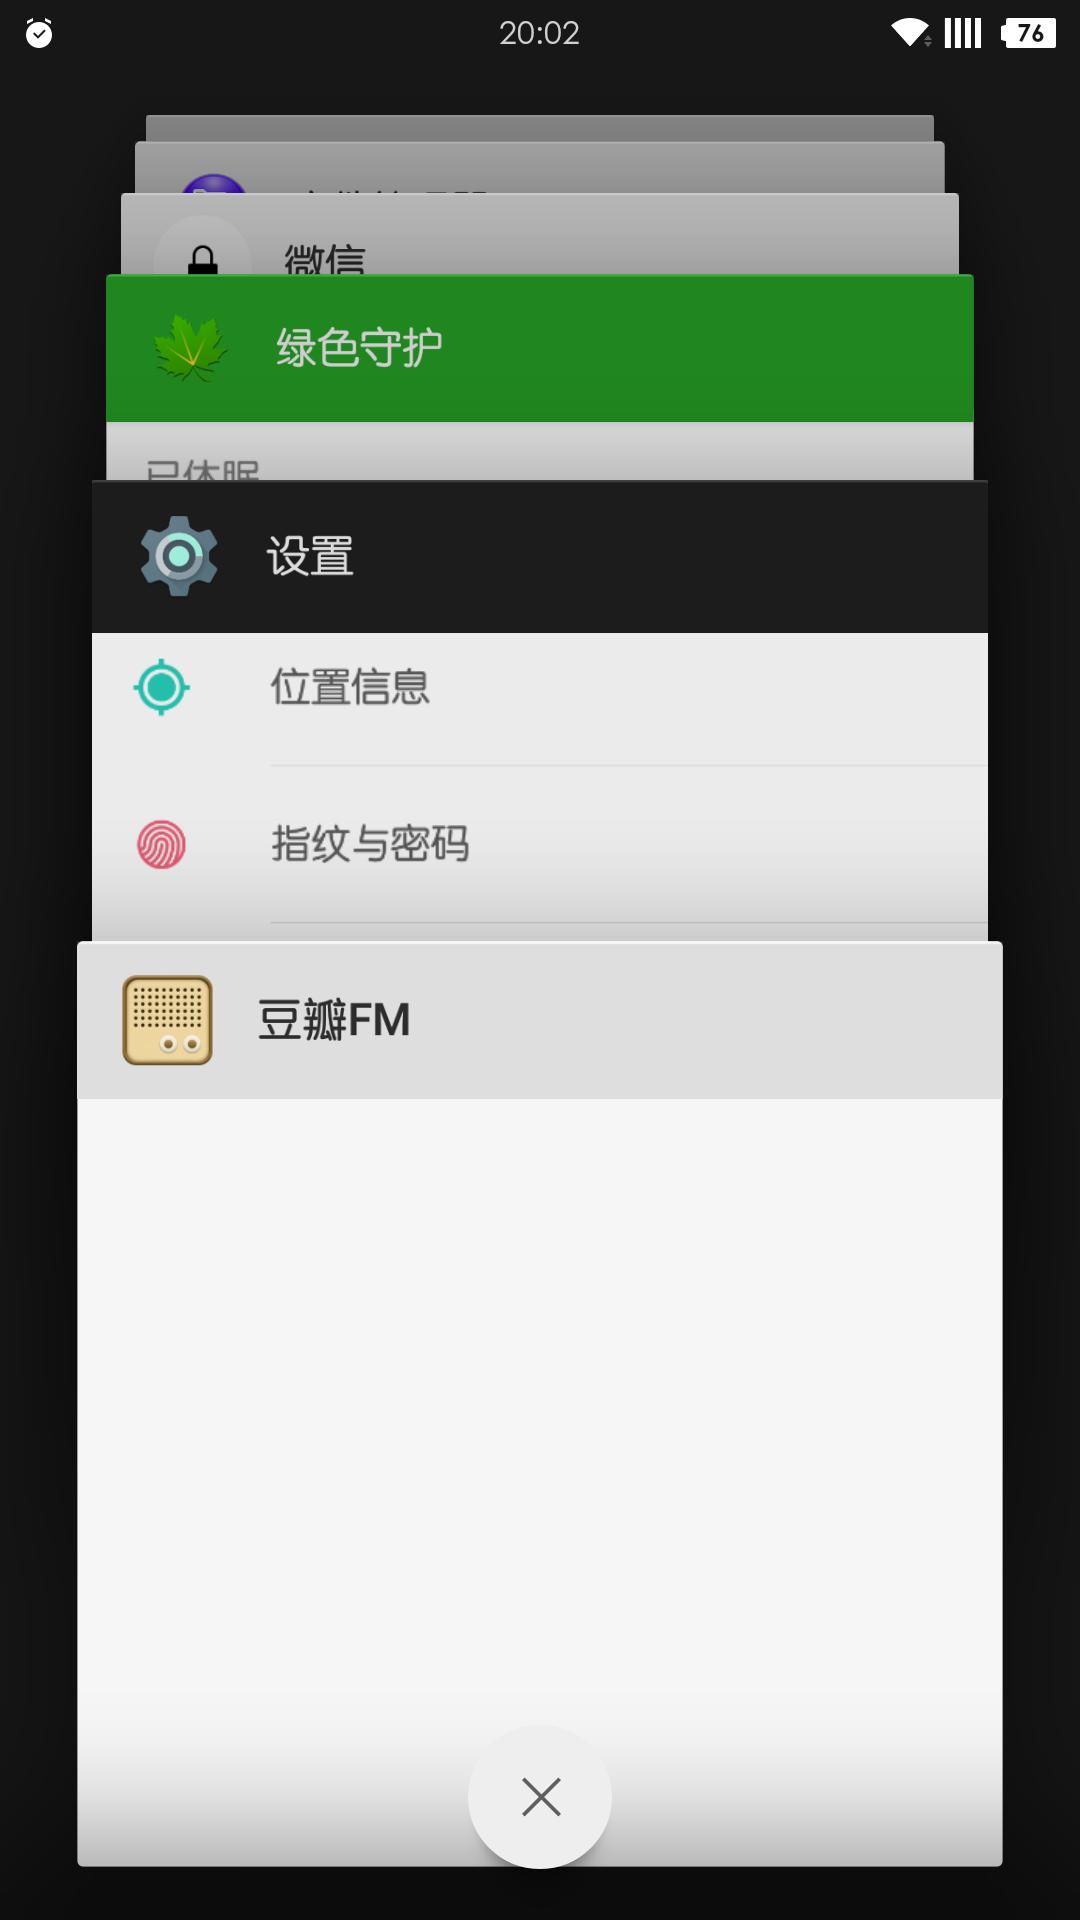 Screenshot_2015-10-25-20-02-04.png